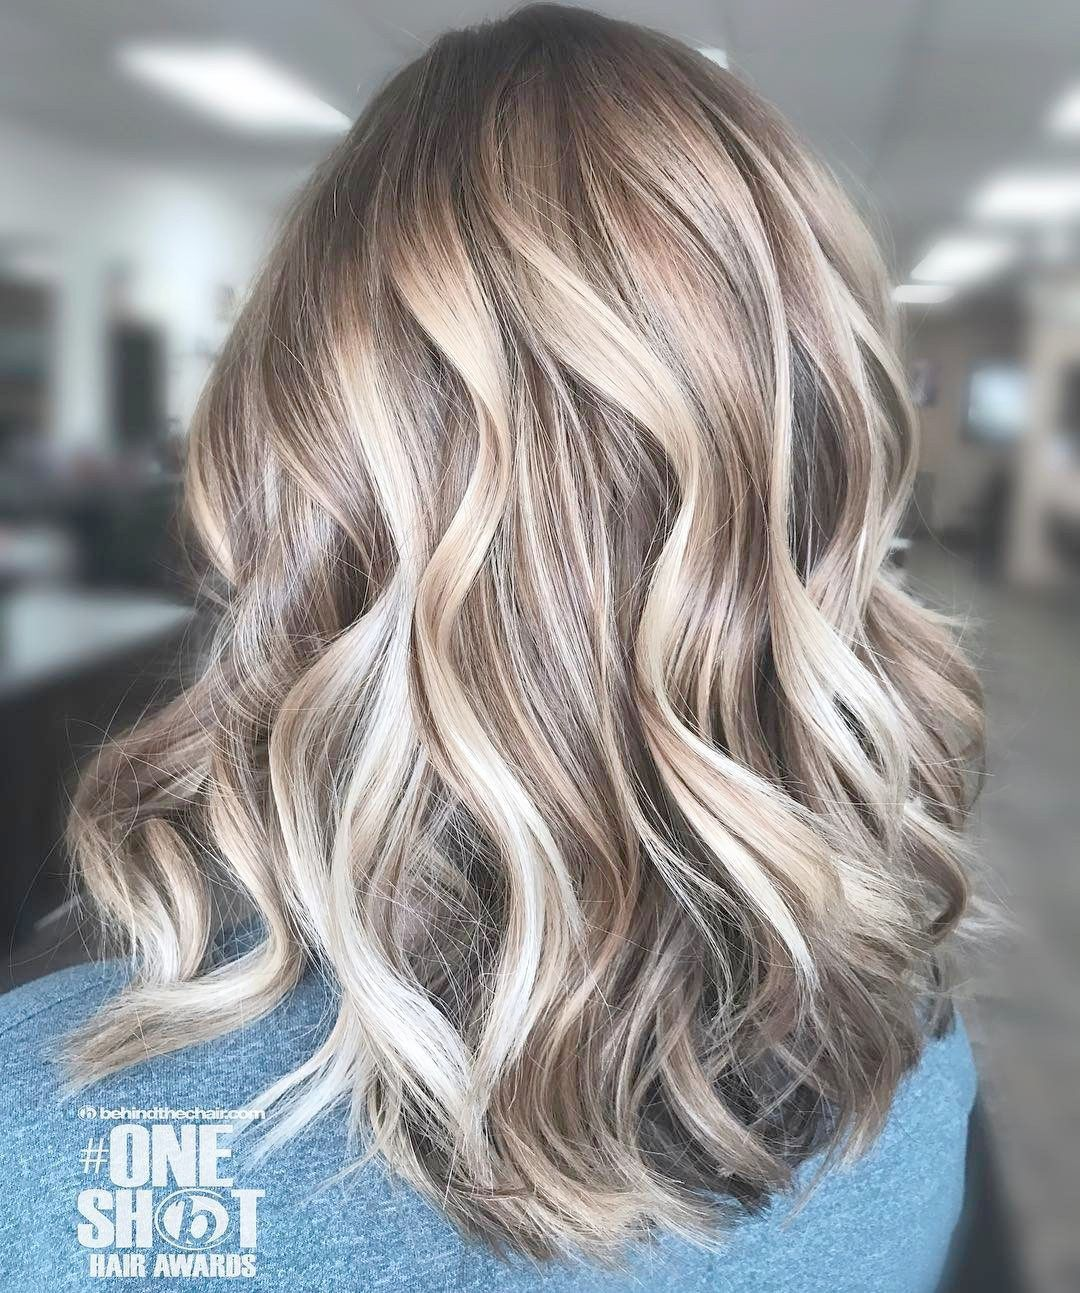 Hair Salon Near Me Hair Dye My Hair Salon Near Me Hairstyles App Over Hair Salon Downtown My Hairless Cat Gr Medium Hair Styles Hair Color Balayage Balayage